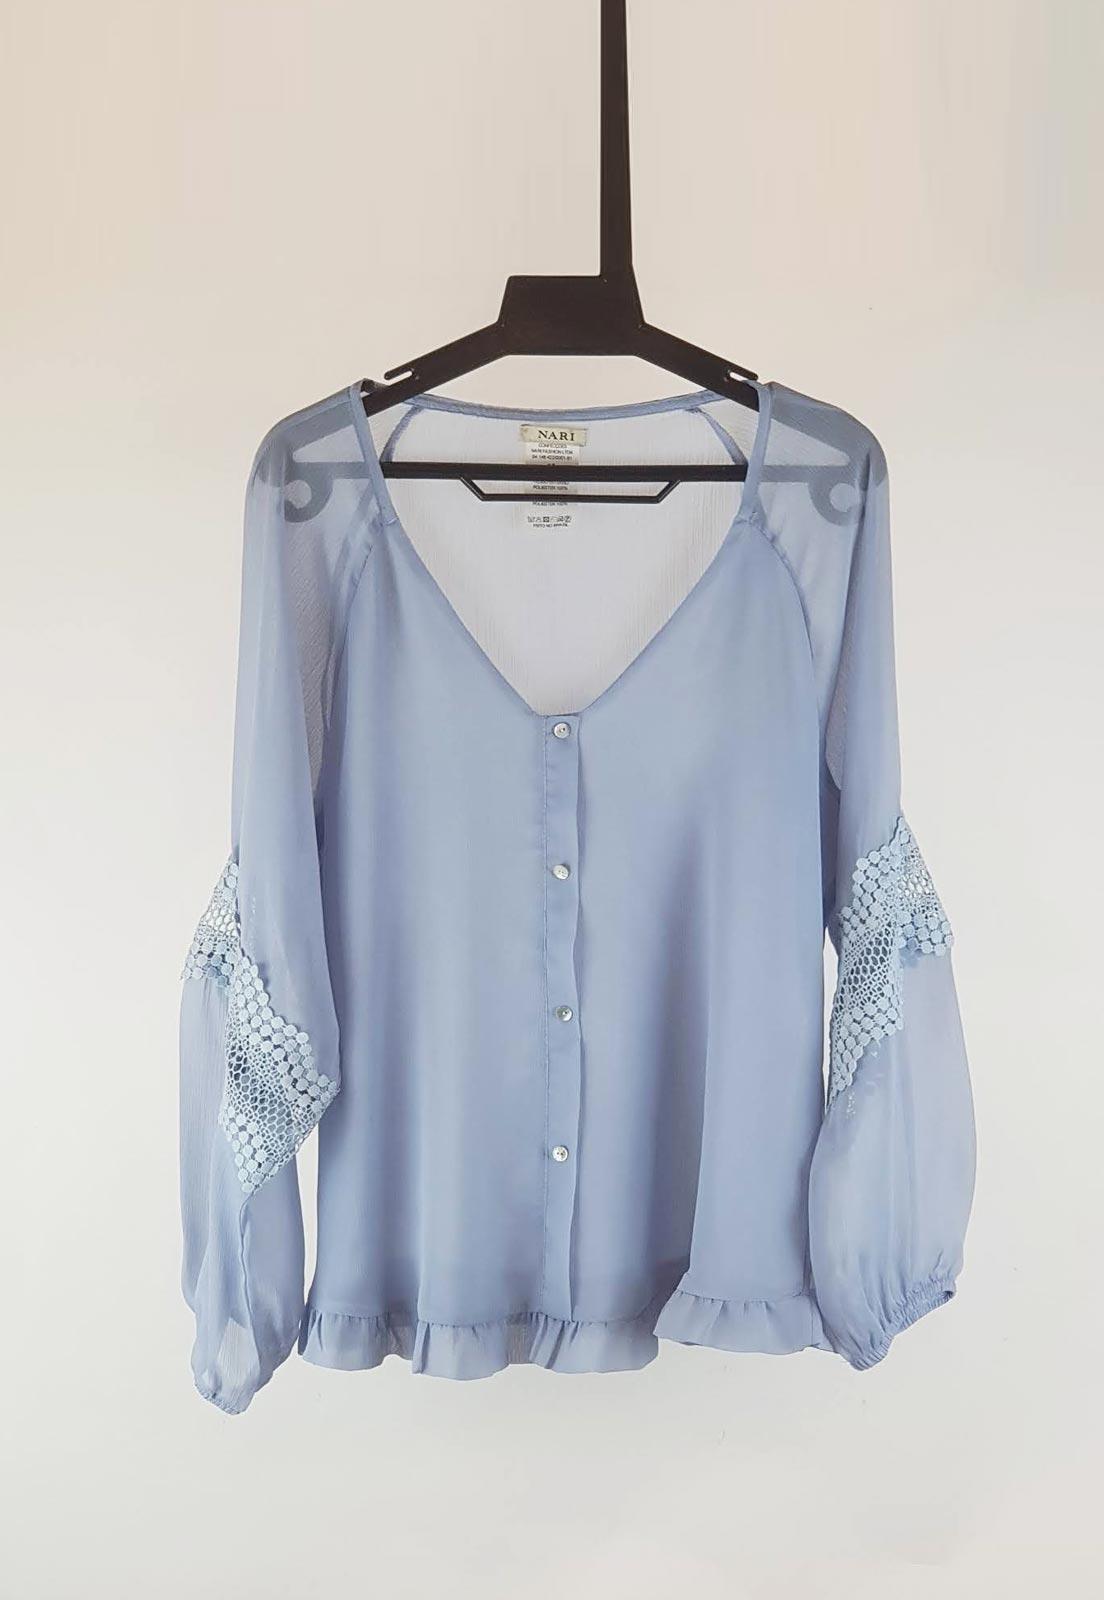 Blusa azul serenity de manga longa  Ref. 2612